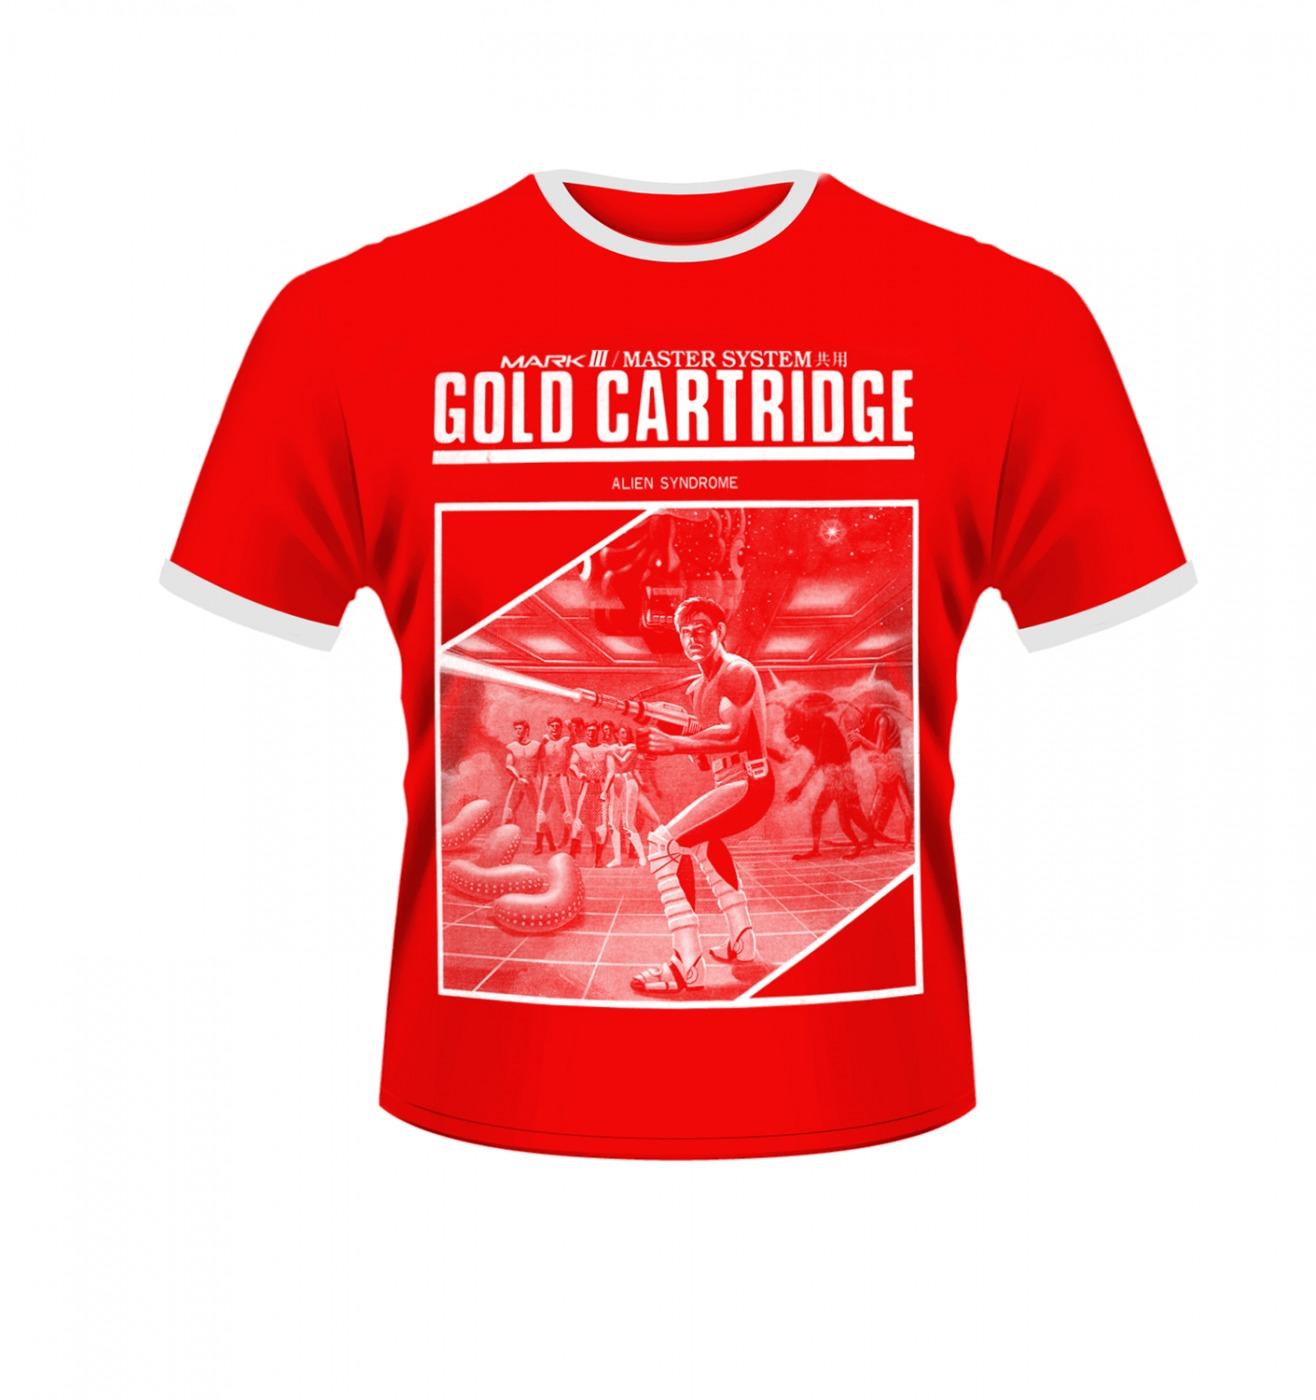 SEGA Gold Cartridge men's t-shirt - Official